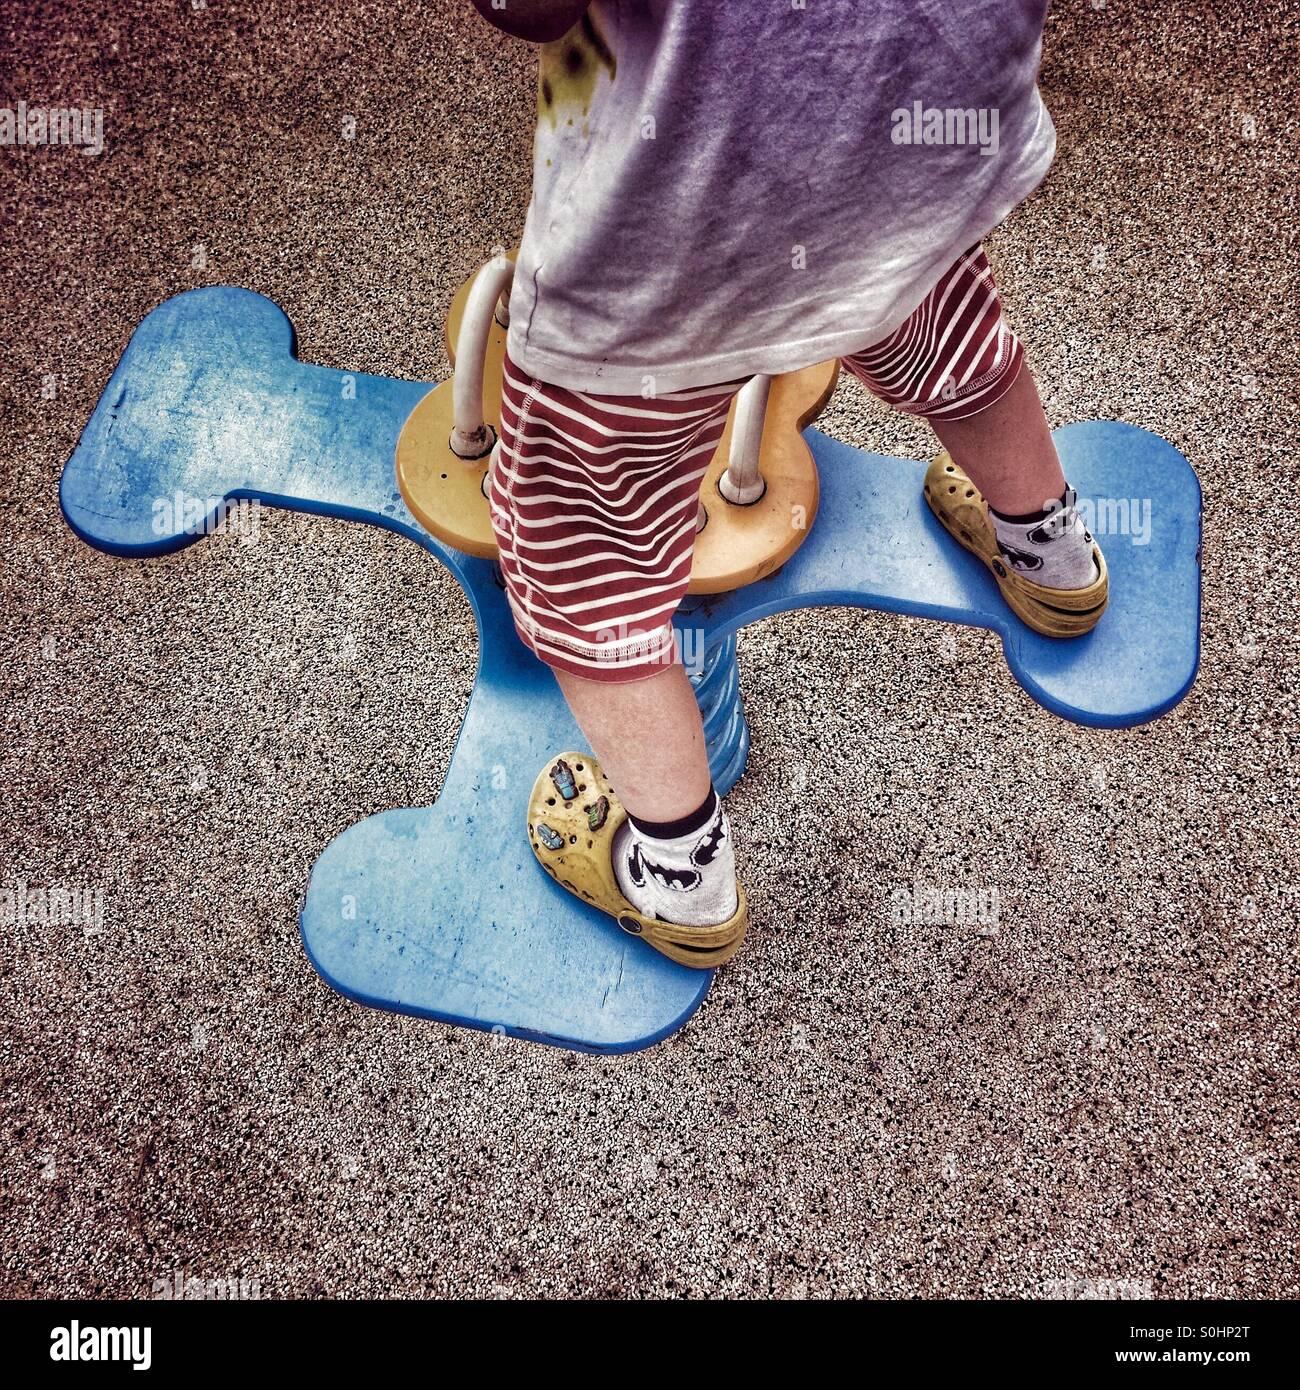 Young boy balancing on playground ride - Stock Image